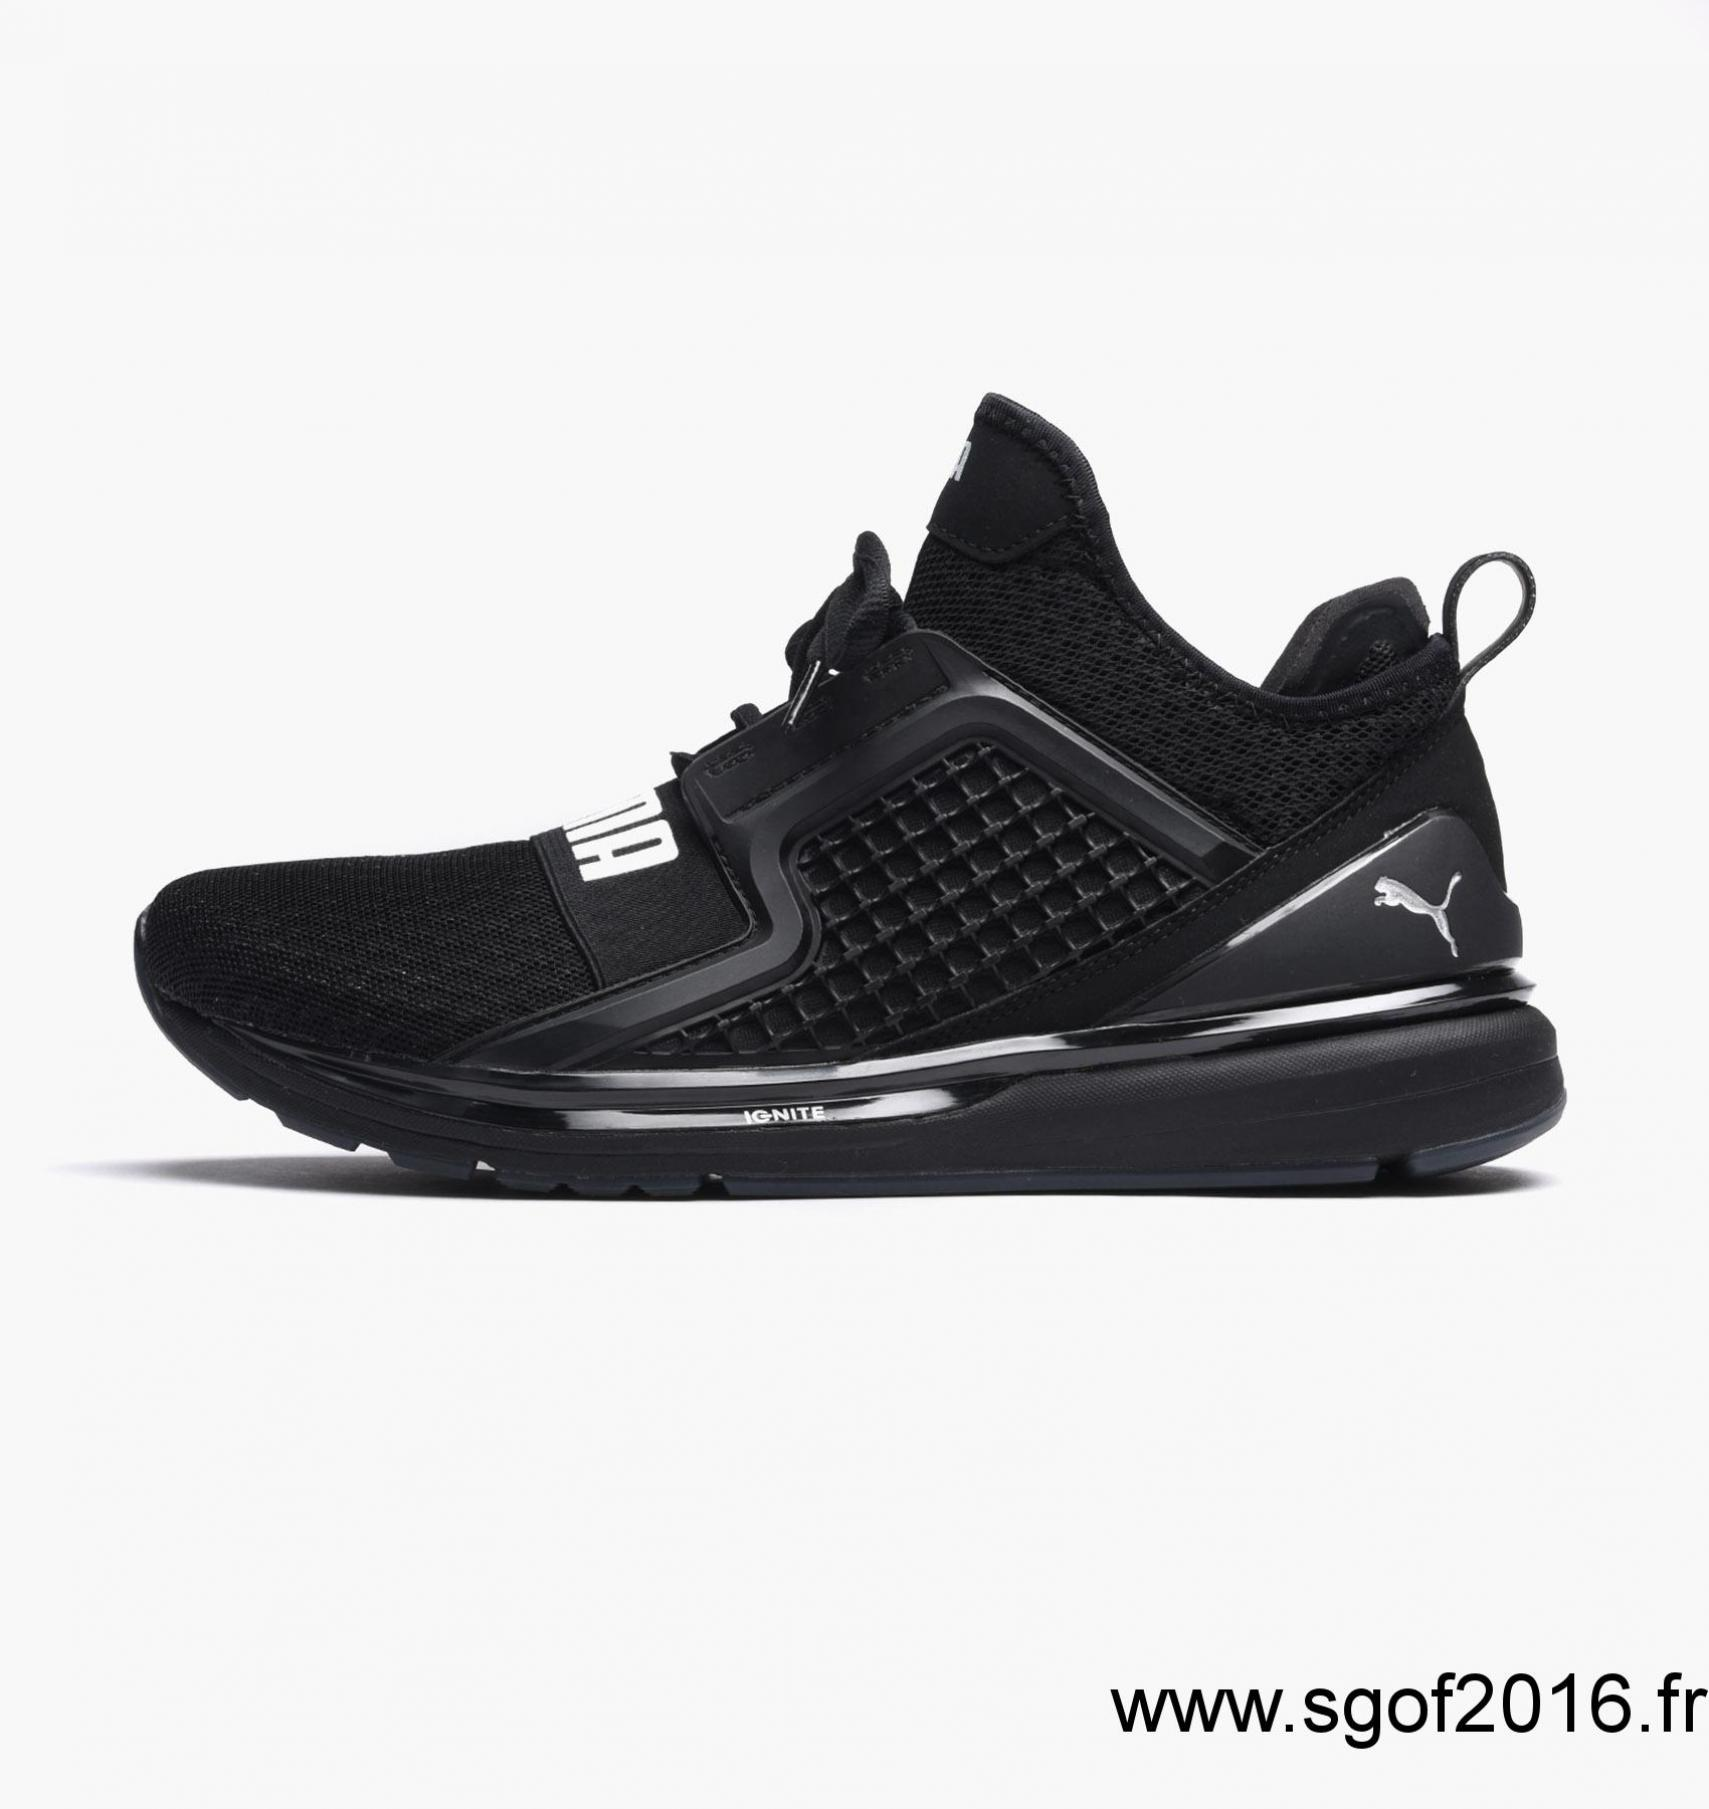 chaussure puma femmes 2018